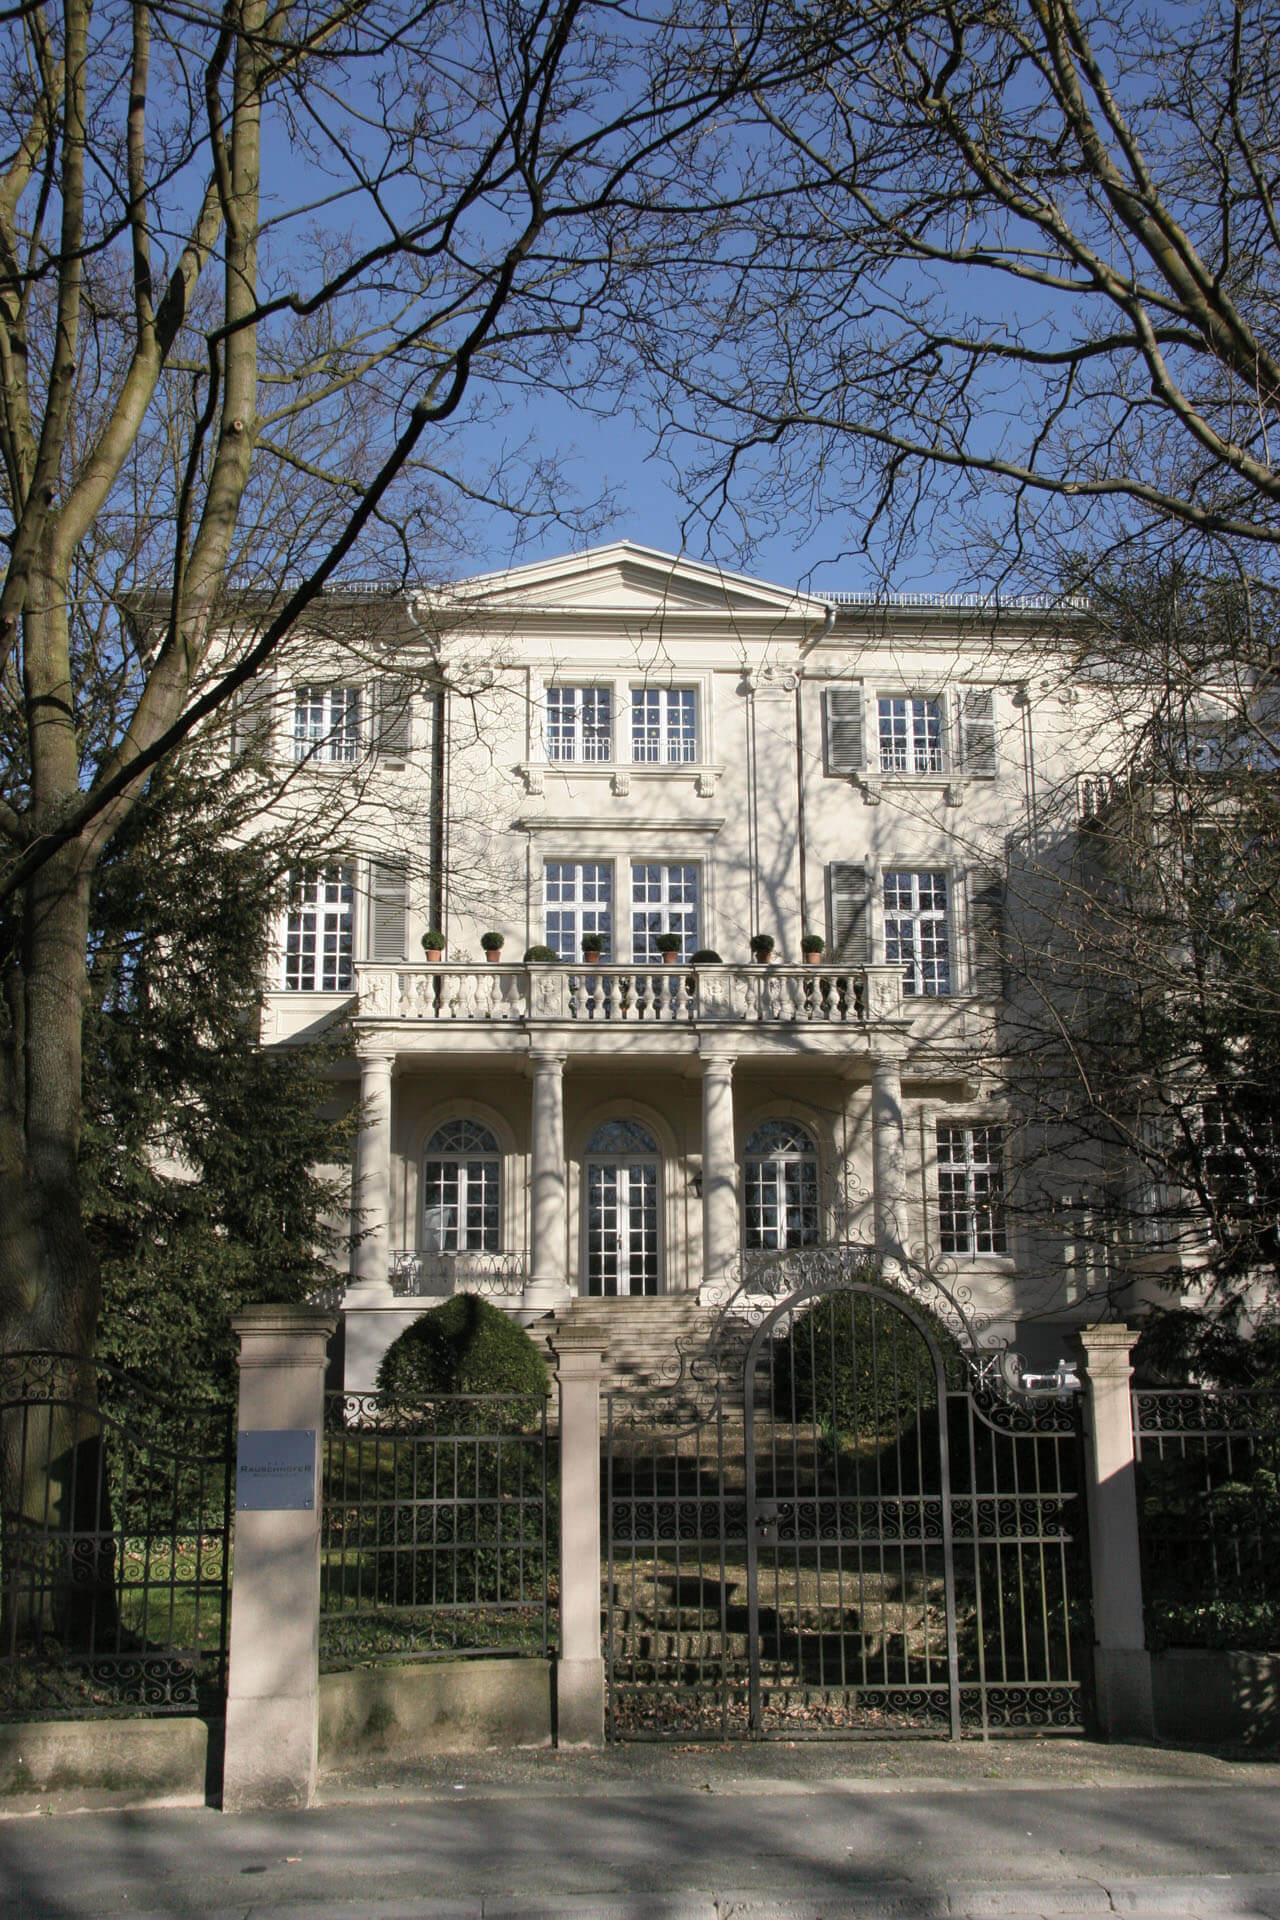 Prinz Wiesbaden